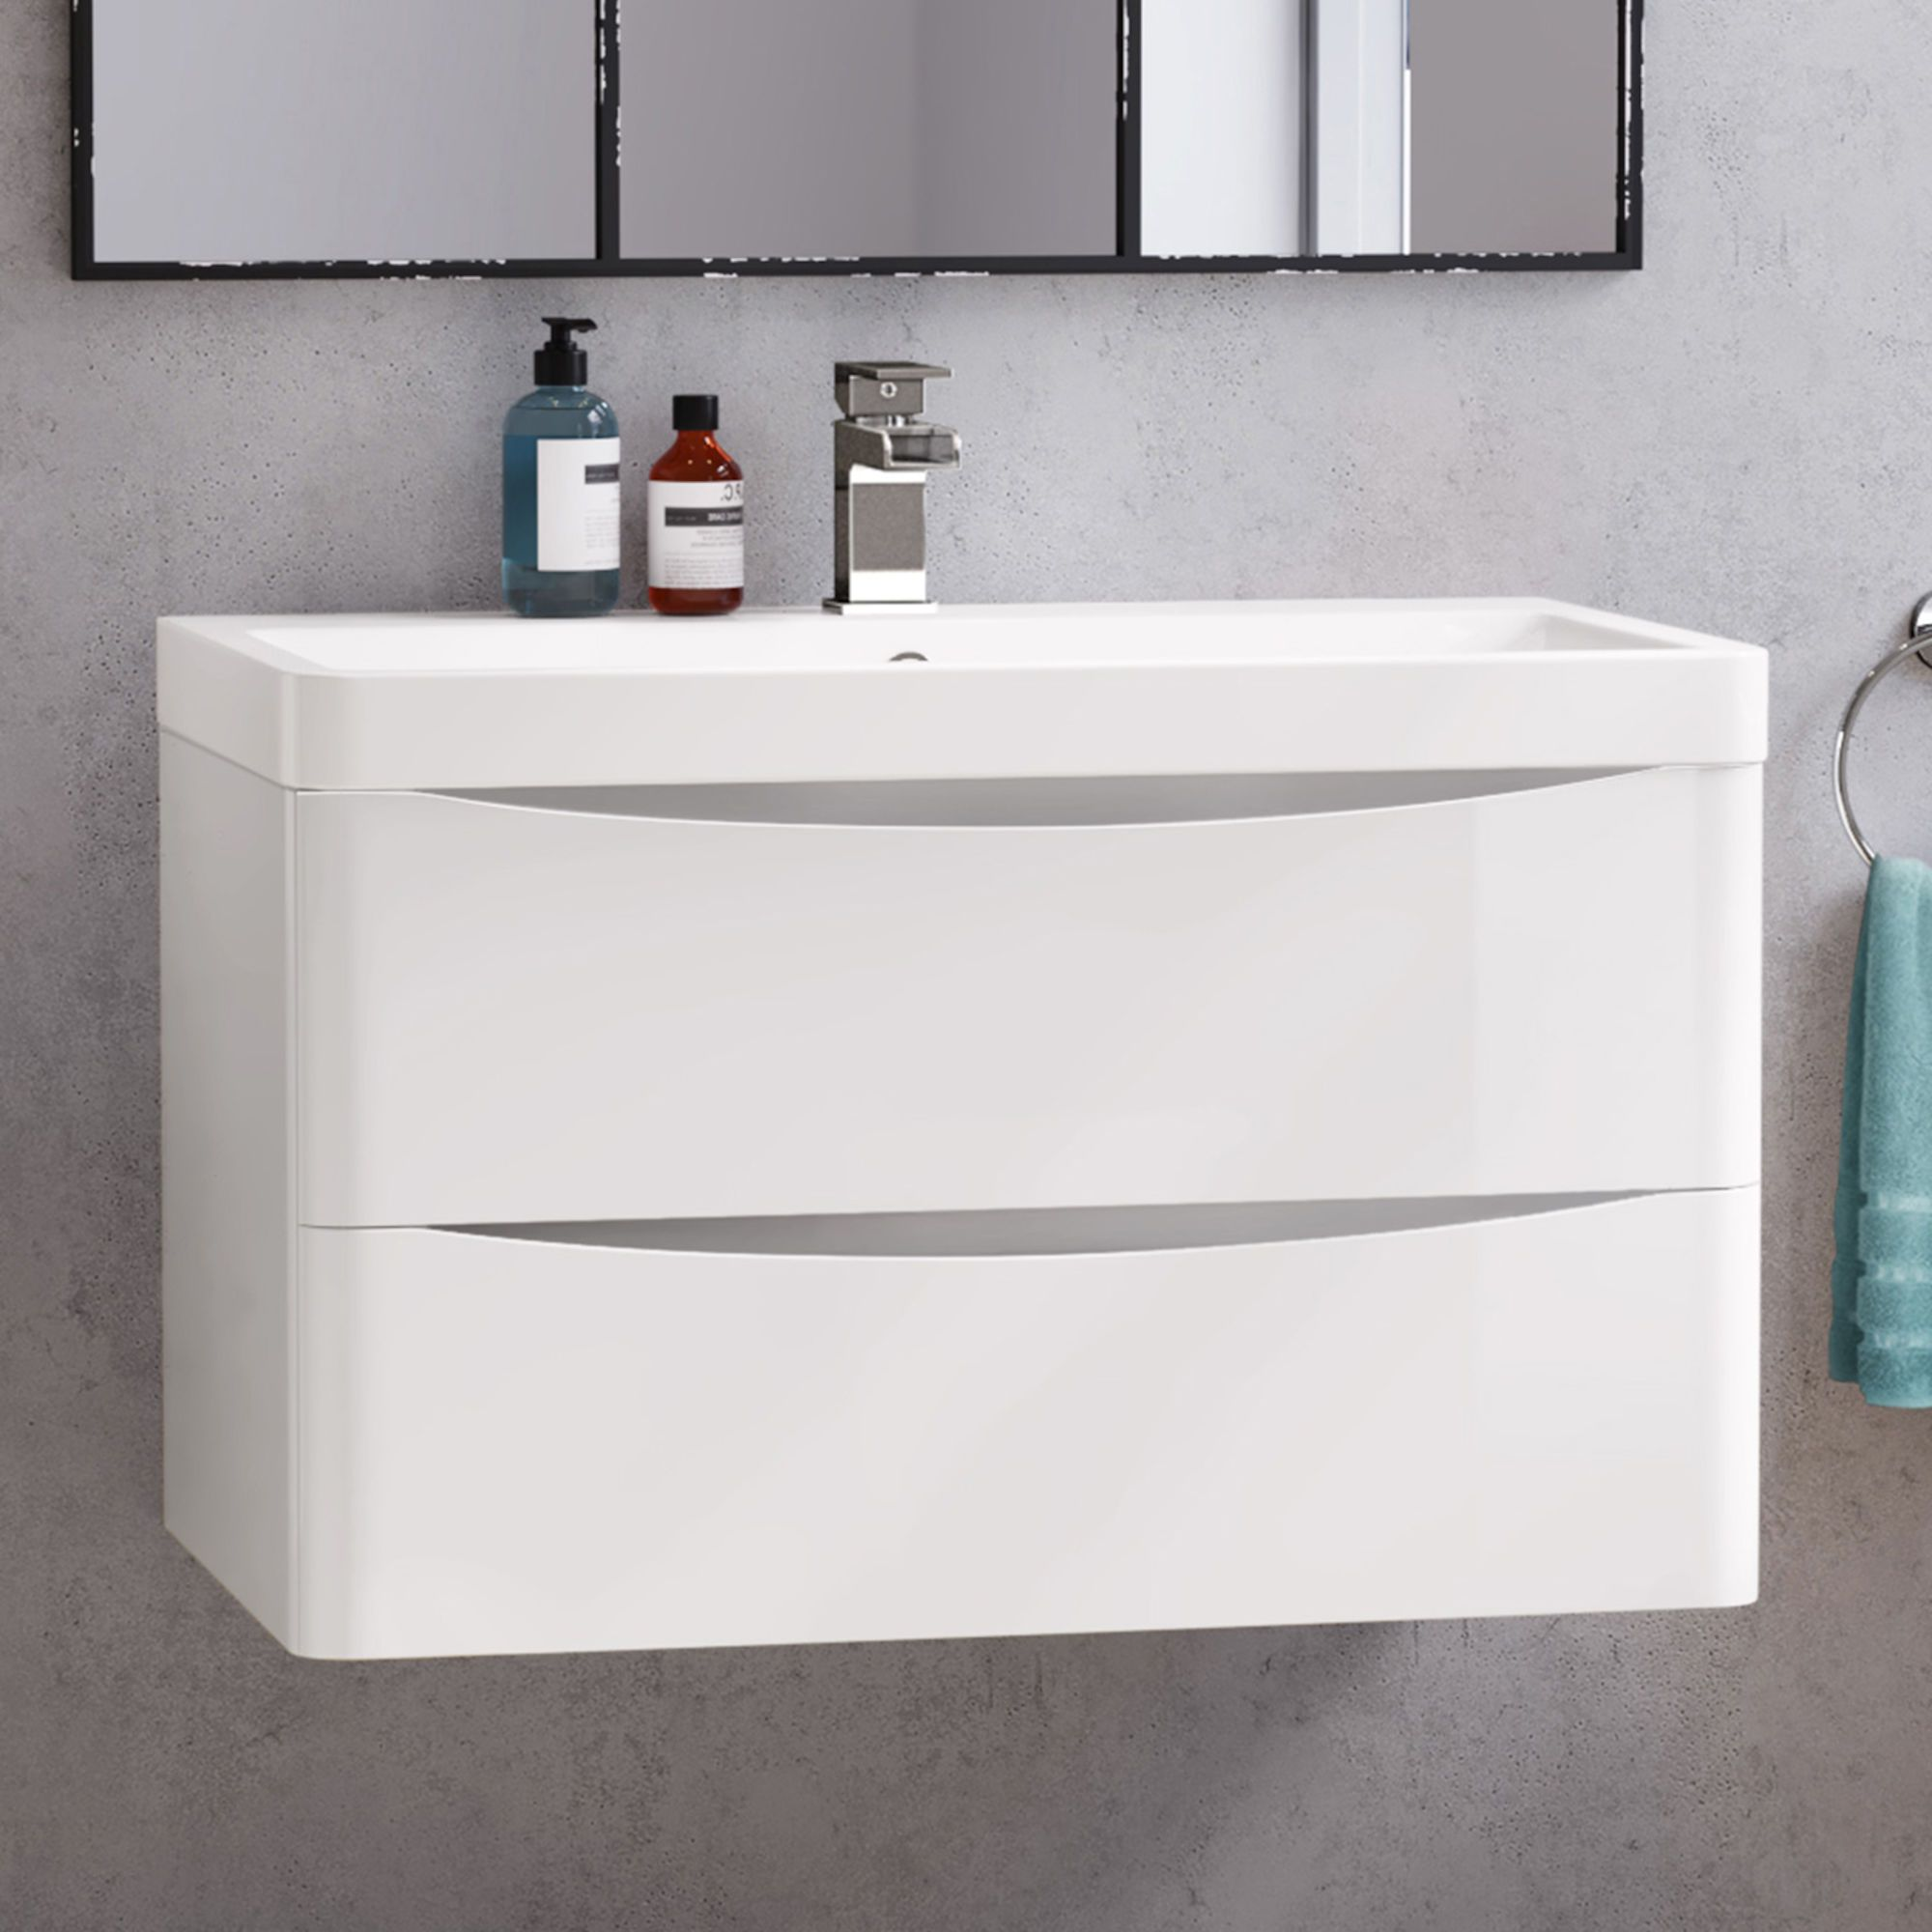 800mm Austin Ii Gloss White Built In Basin Drawer Unit Wall Hung Vanity Units Bathroom Furniture Storage Wall Hung Vanity